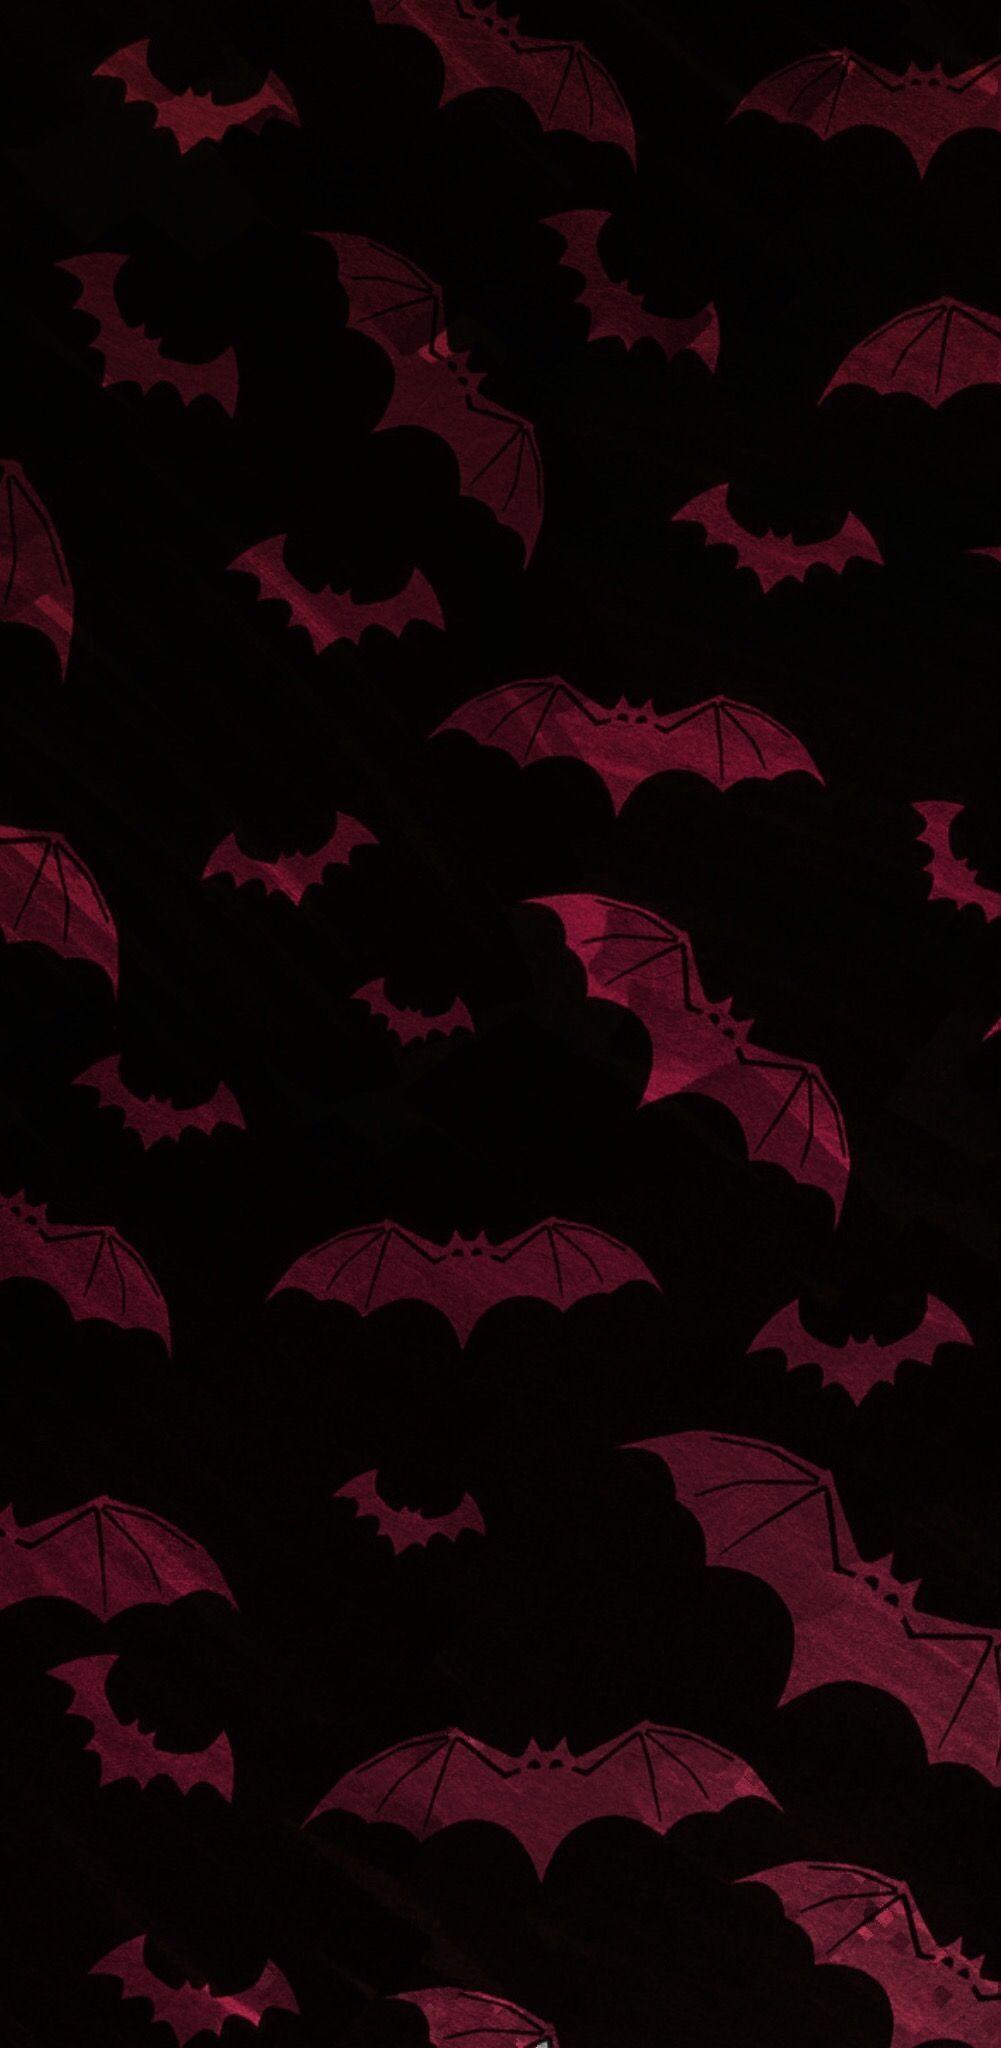 Pin By Shikuka Attwell On Vampire Gothic Wallpaper Goth Wallpaper Halloween Wallpaper Iphone